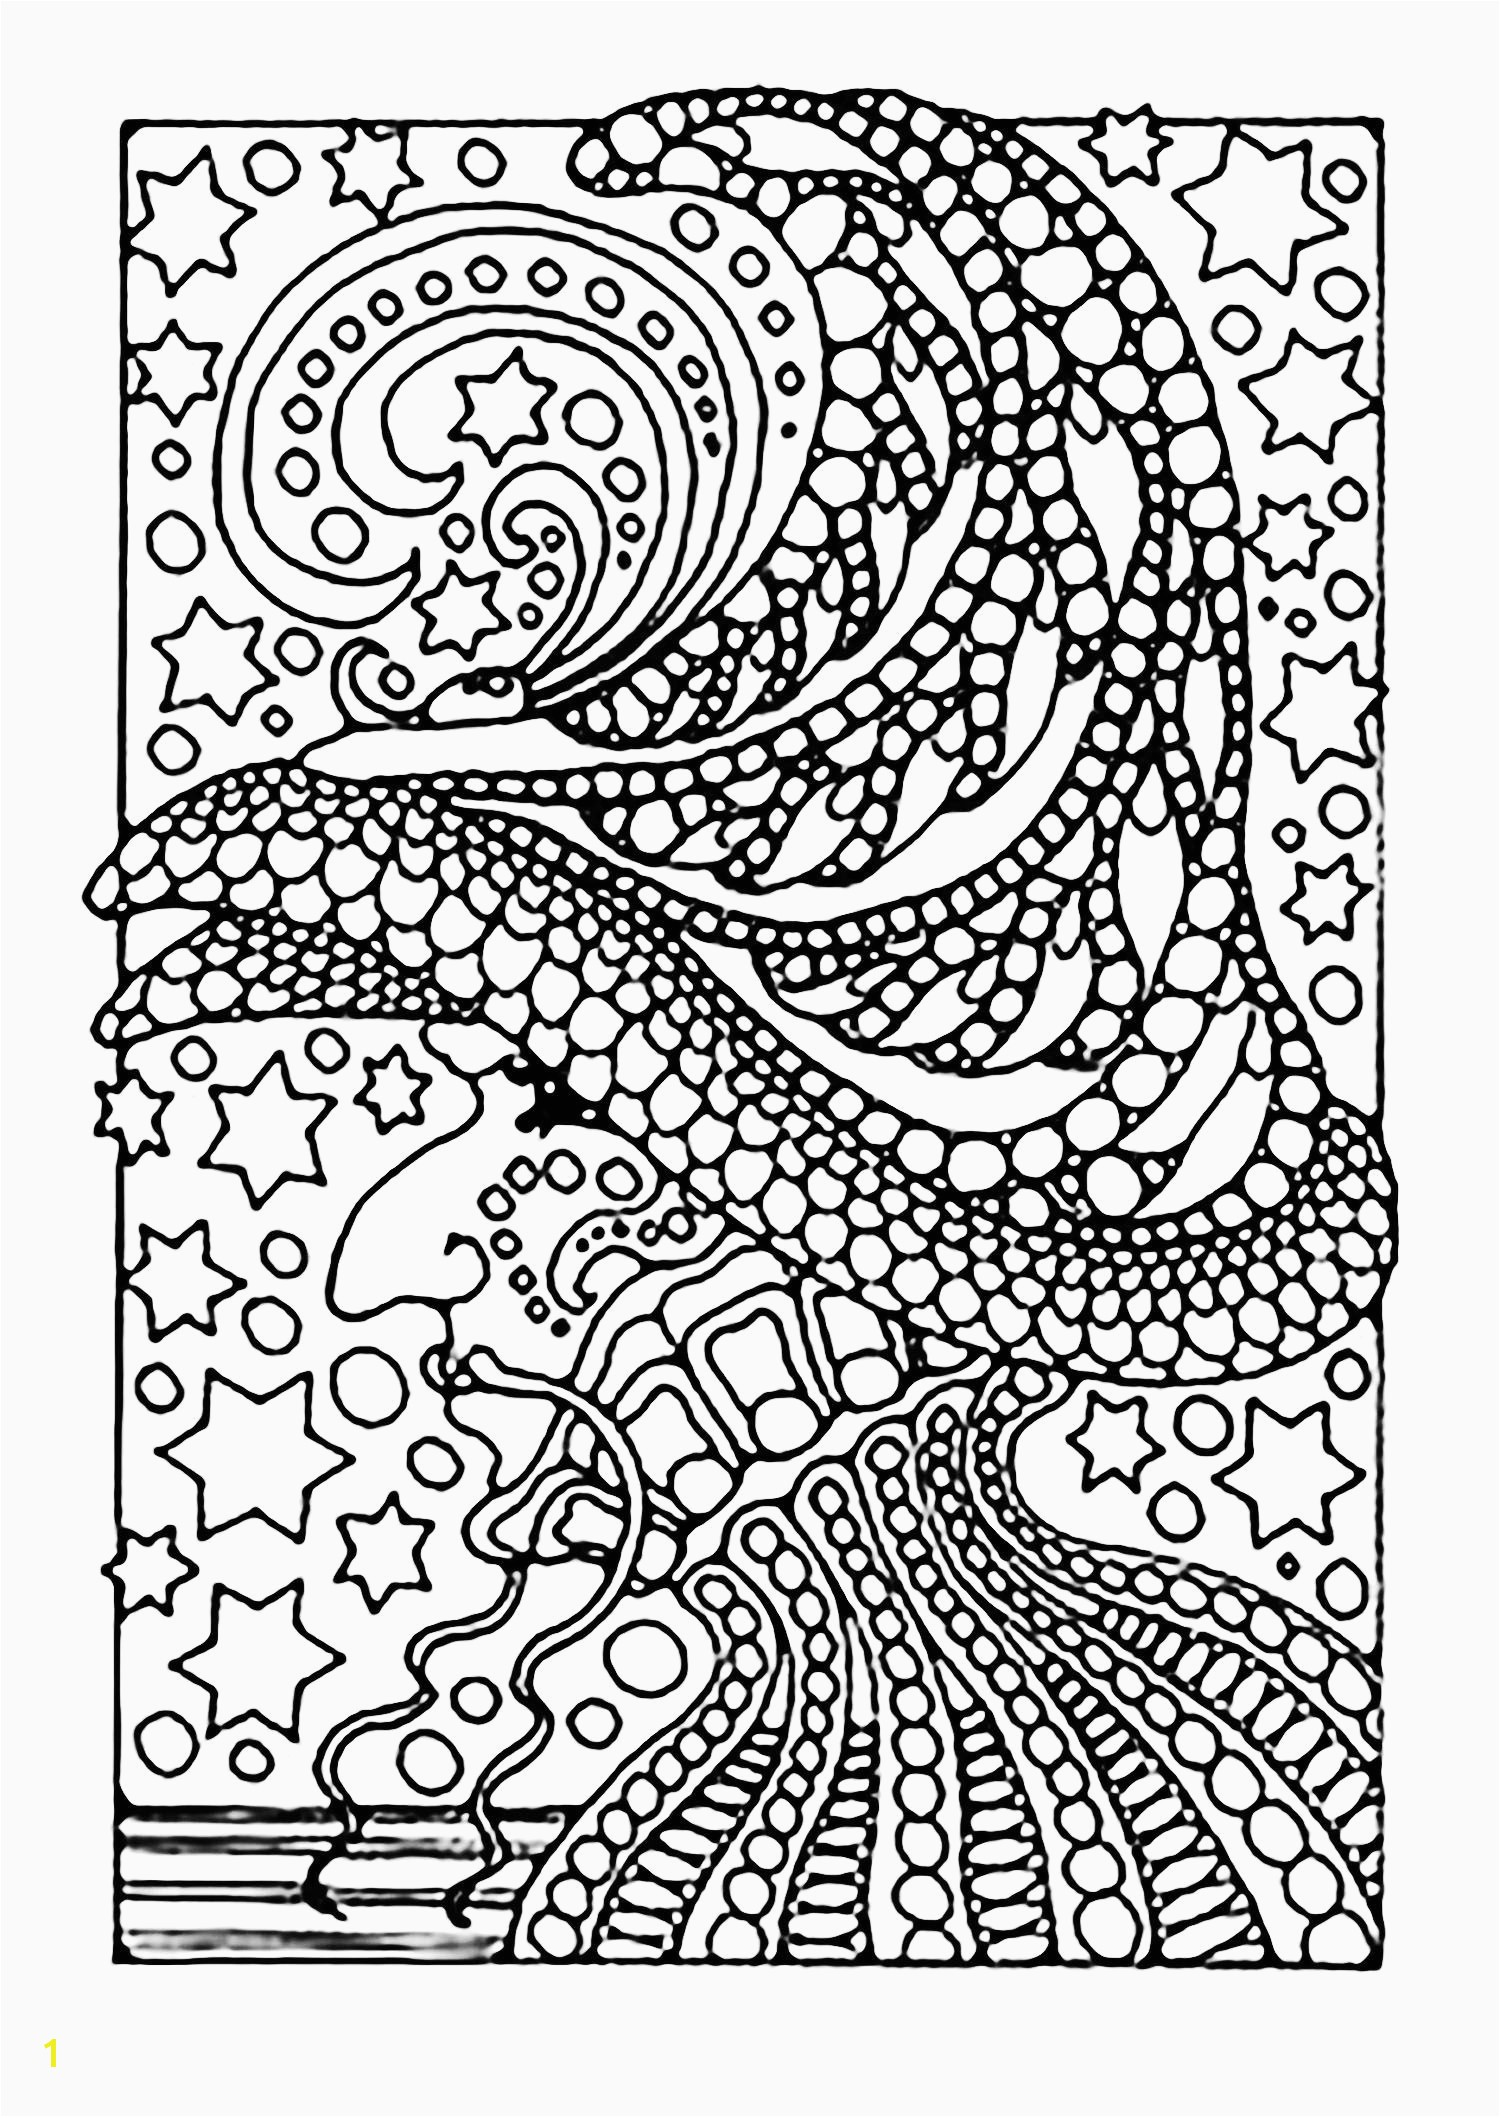 Mandala Coloring Pages Printable Luxury Free Mandala Coloring Pages